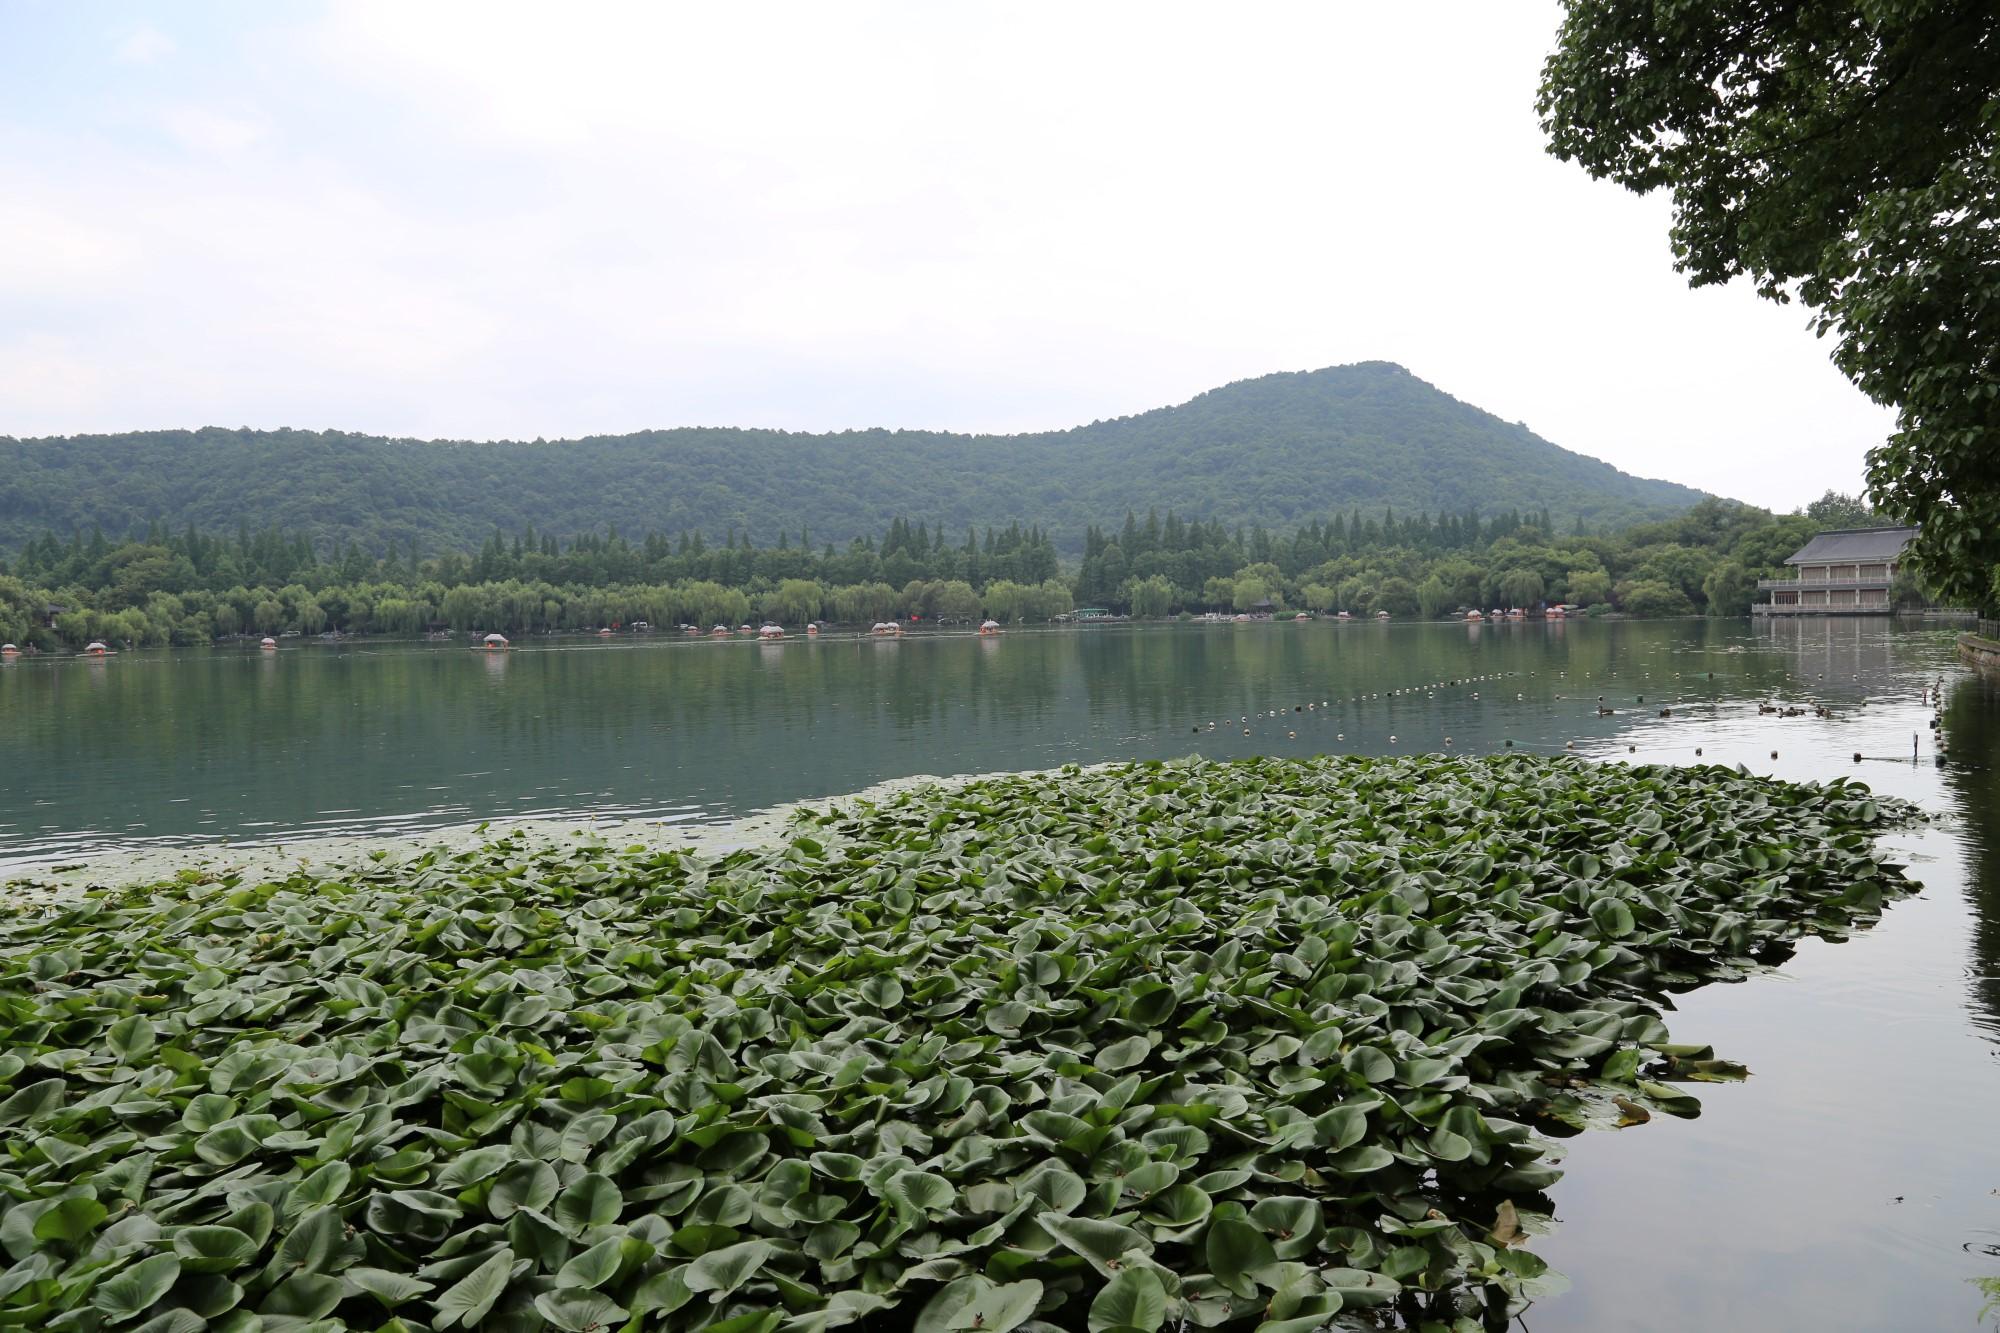 بحيرة هانغتشو